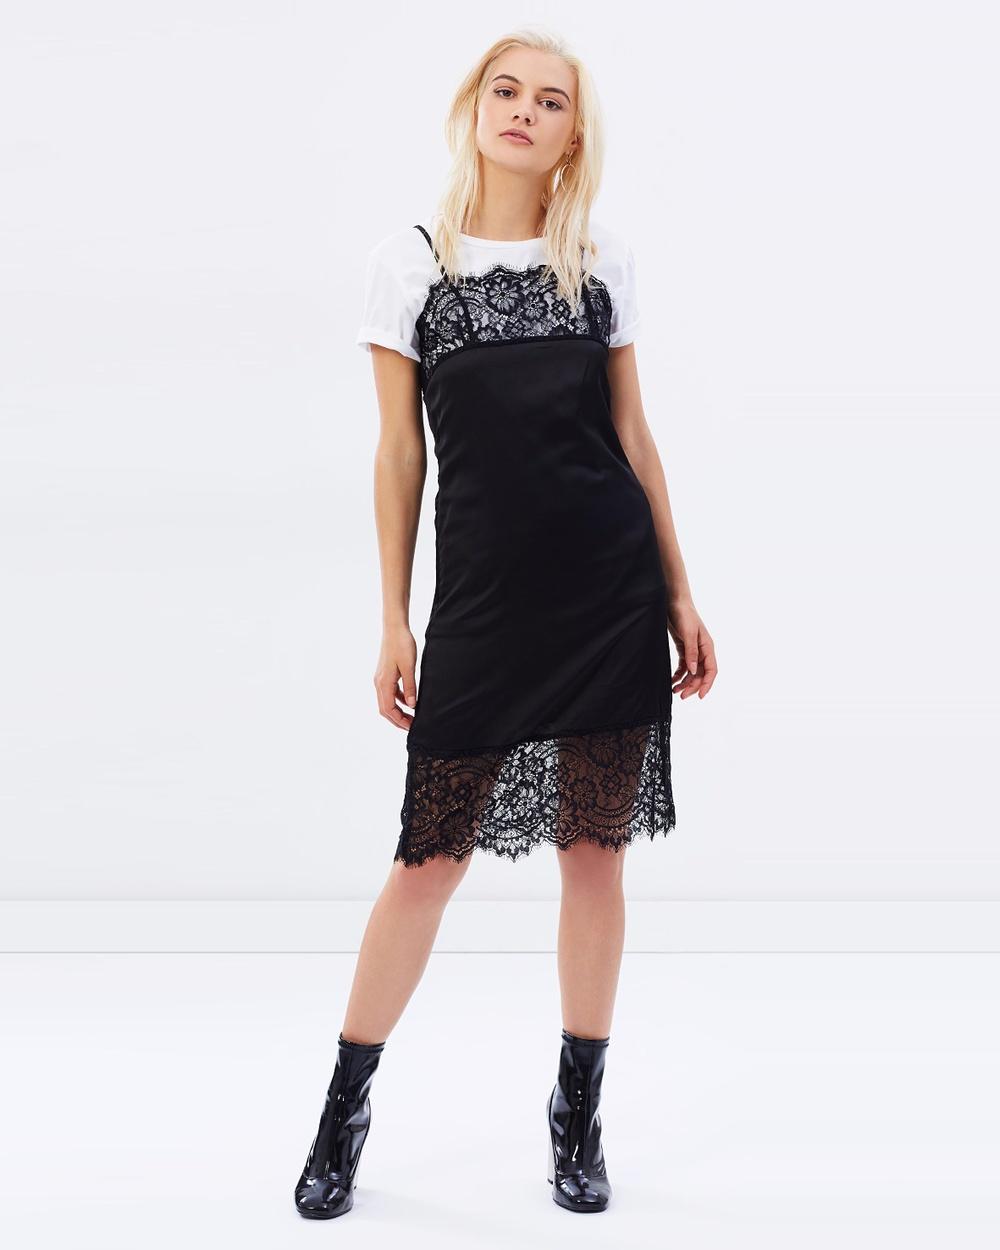 Dahli Dangerously In Love Midi Dress Dresses Black Dangerously In Love Midi Dress